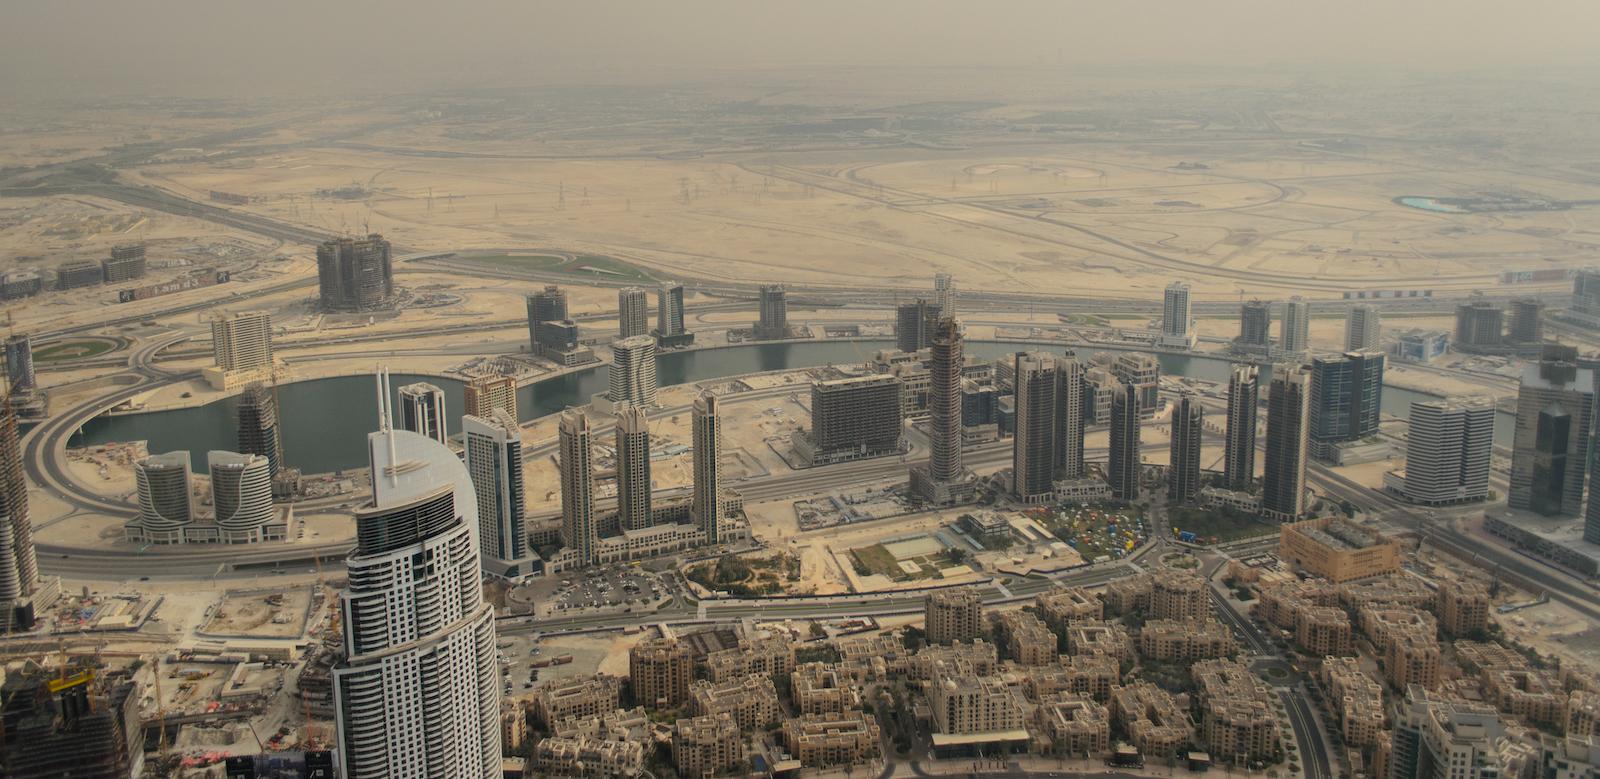 View from the Burj Khalifa: Dubai's glittering surface is getting dusty (Photo: Nasrulla Taha/ Flickr)